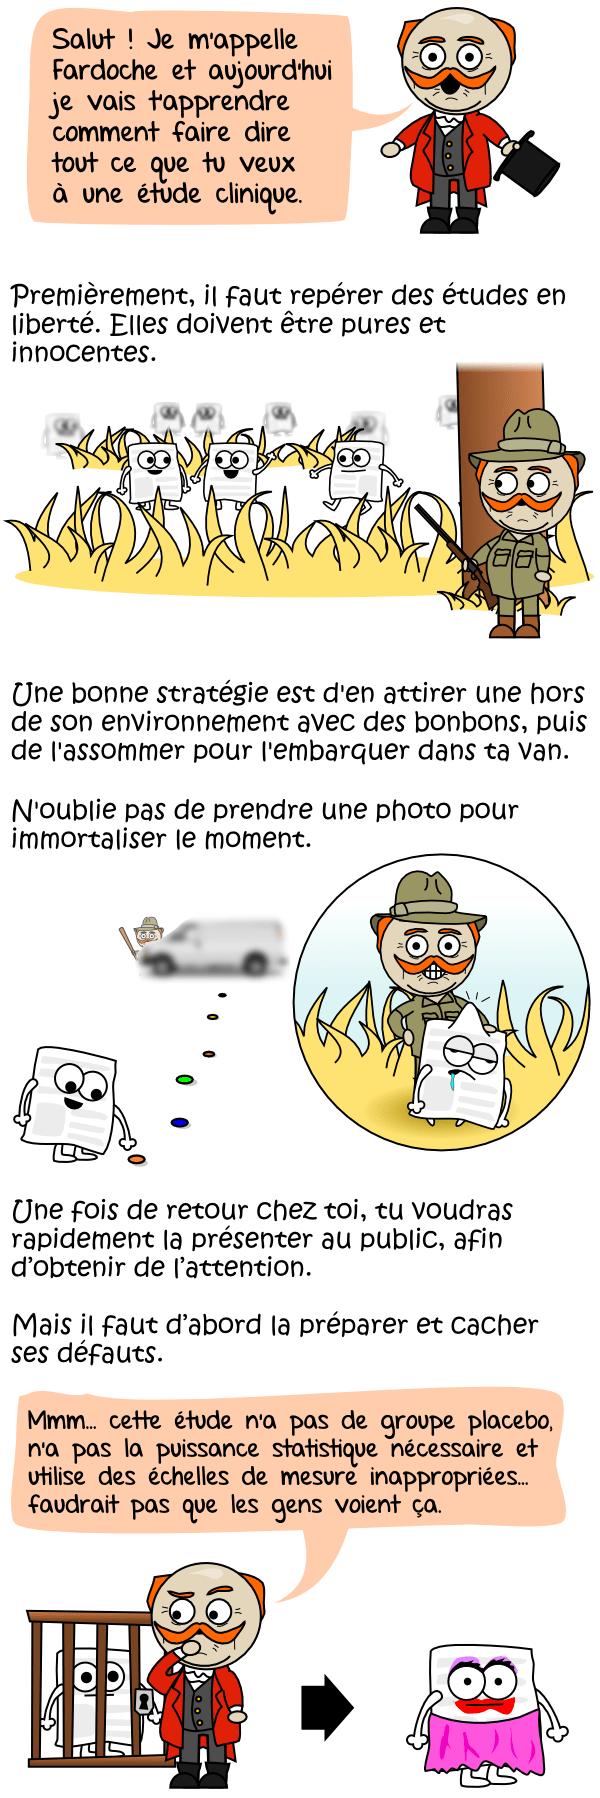 etude_clinique_01